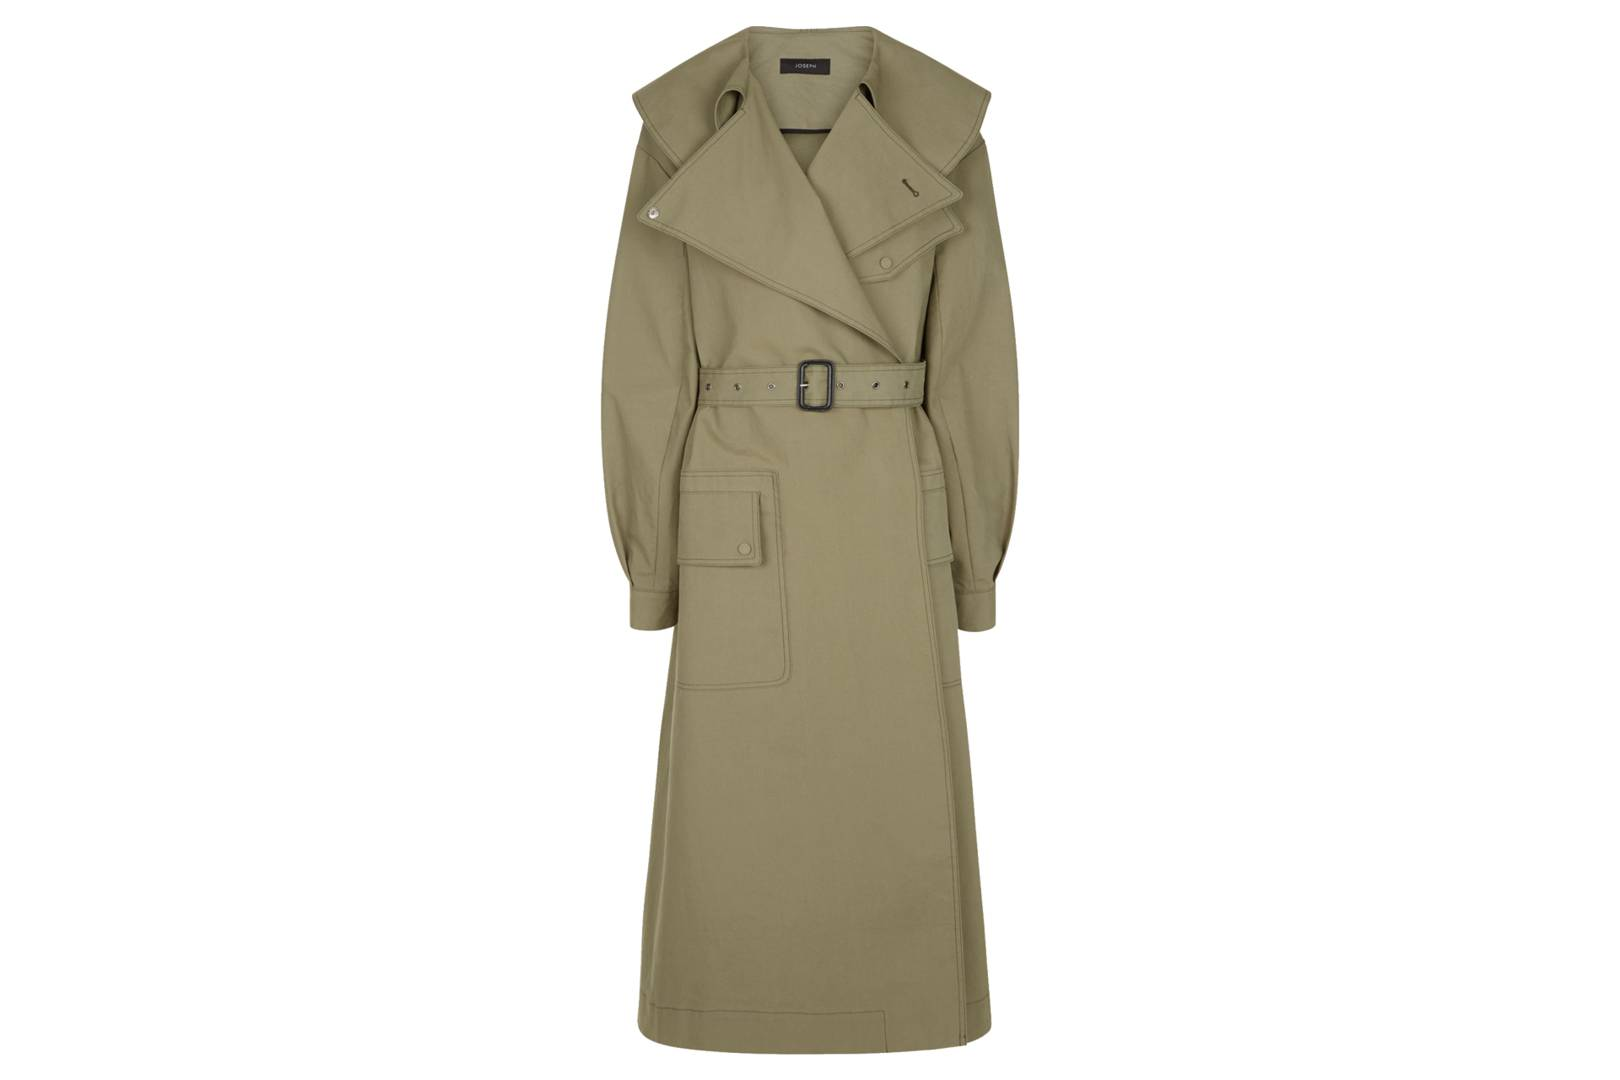 68dc770aa310 10 Best Trench Coats